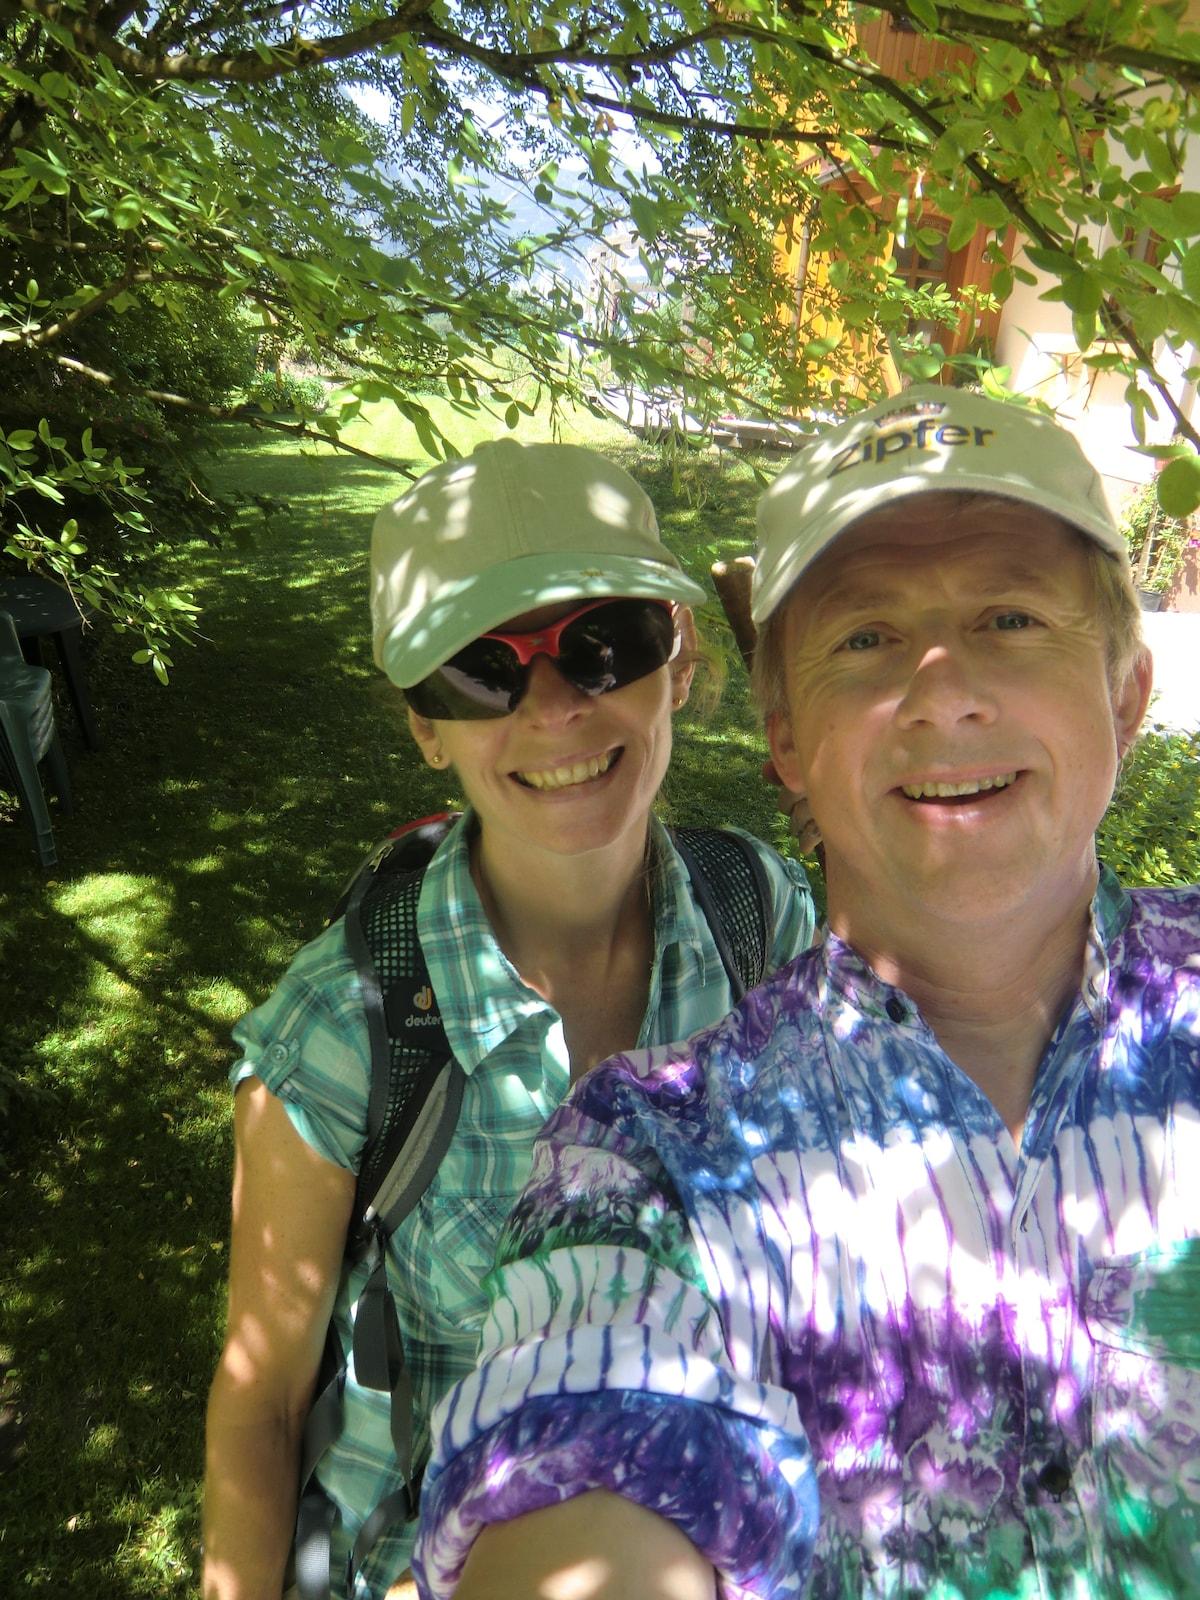 Jillian And Adrian From Obertraun, Austria